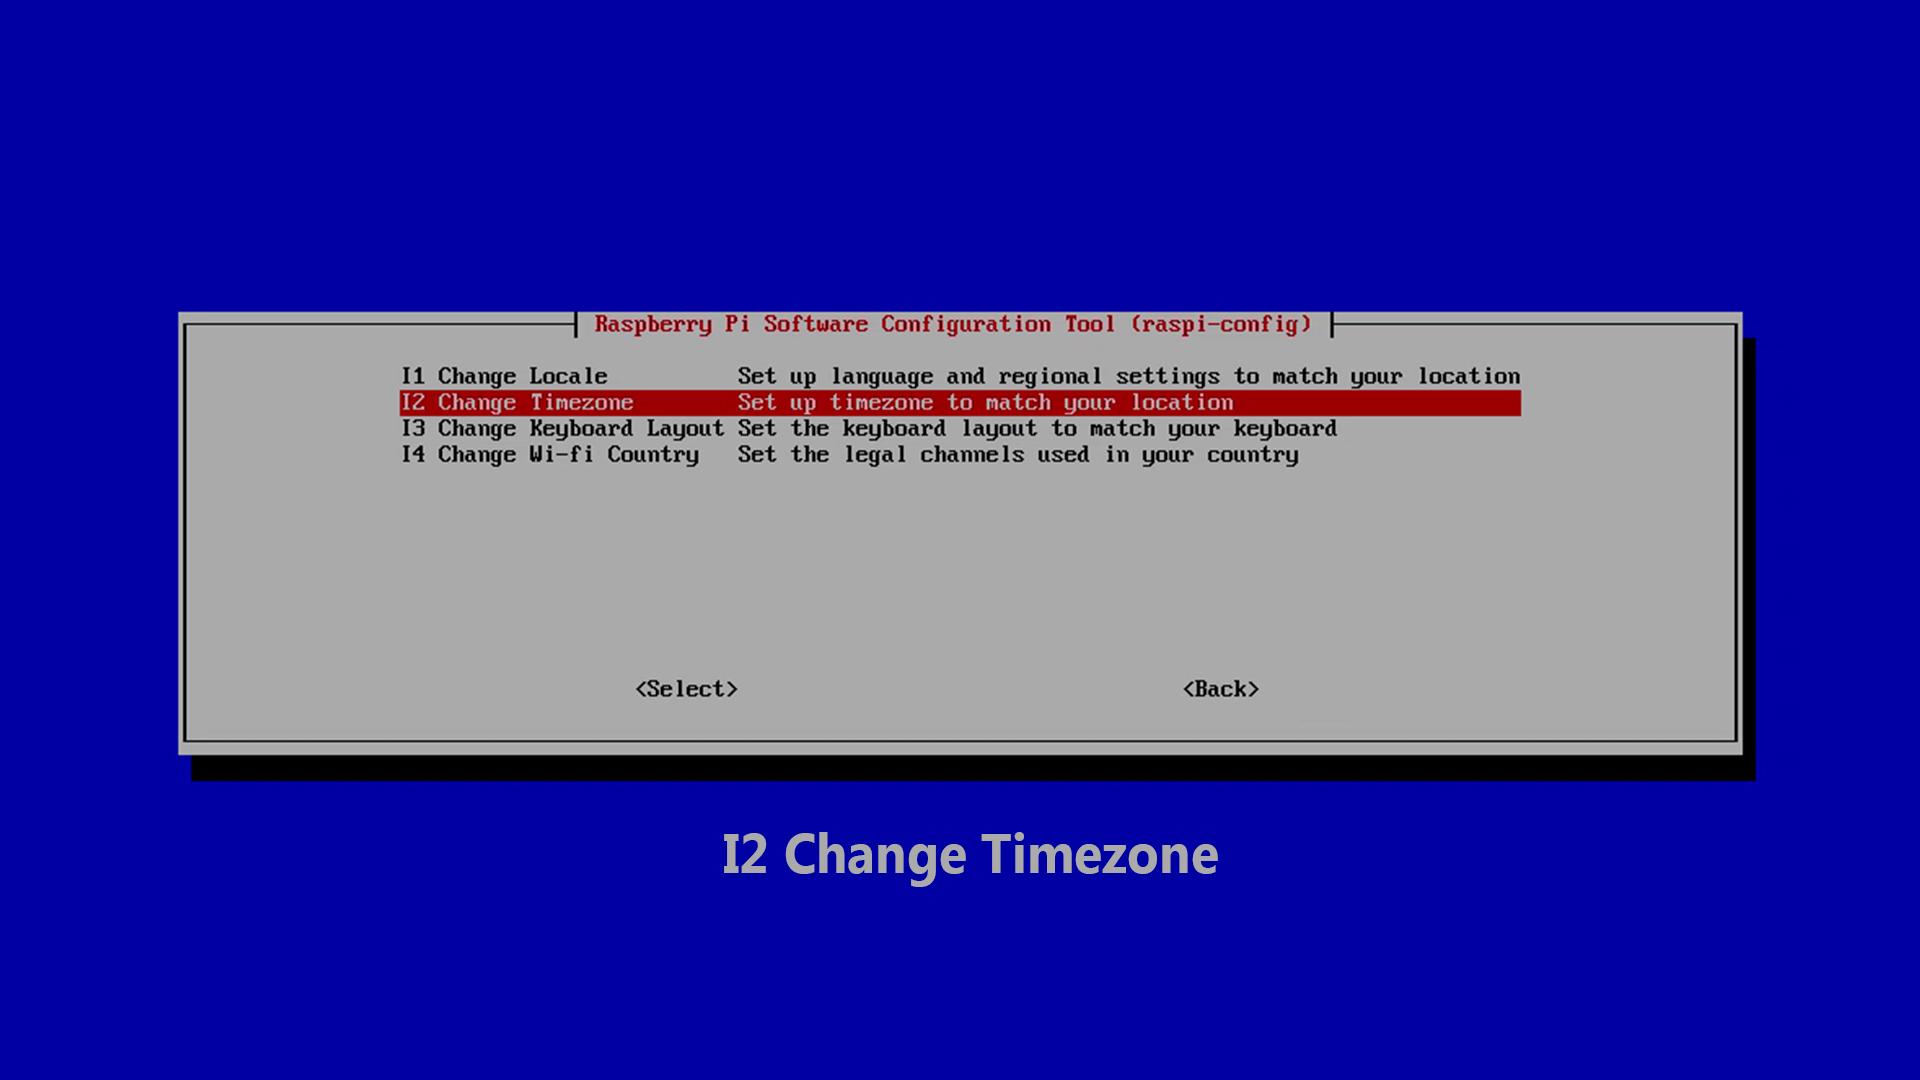 DigitaleWelt RetroPie Anleitung - I2 Change Timezone